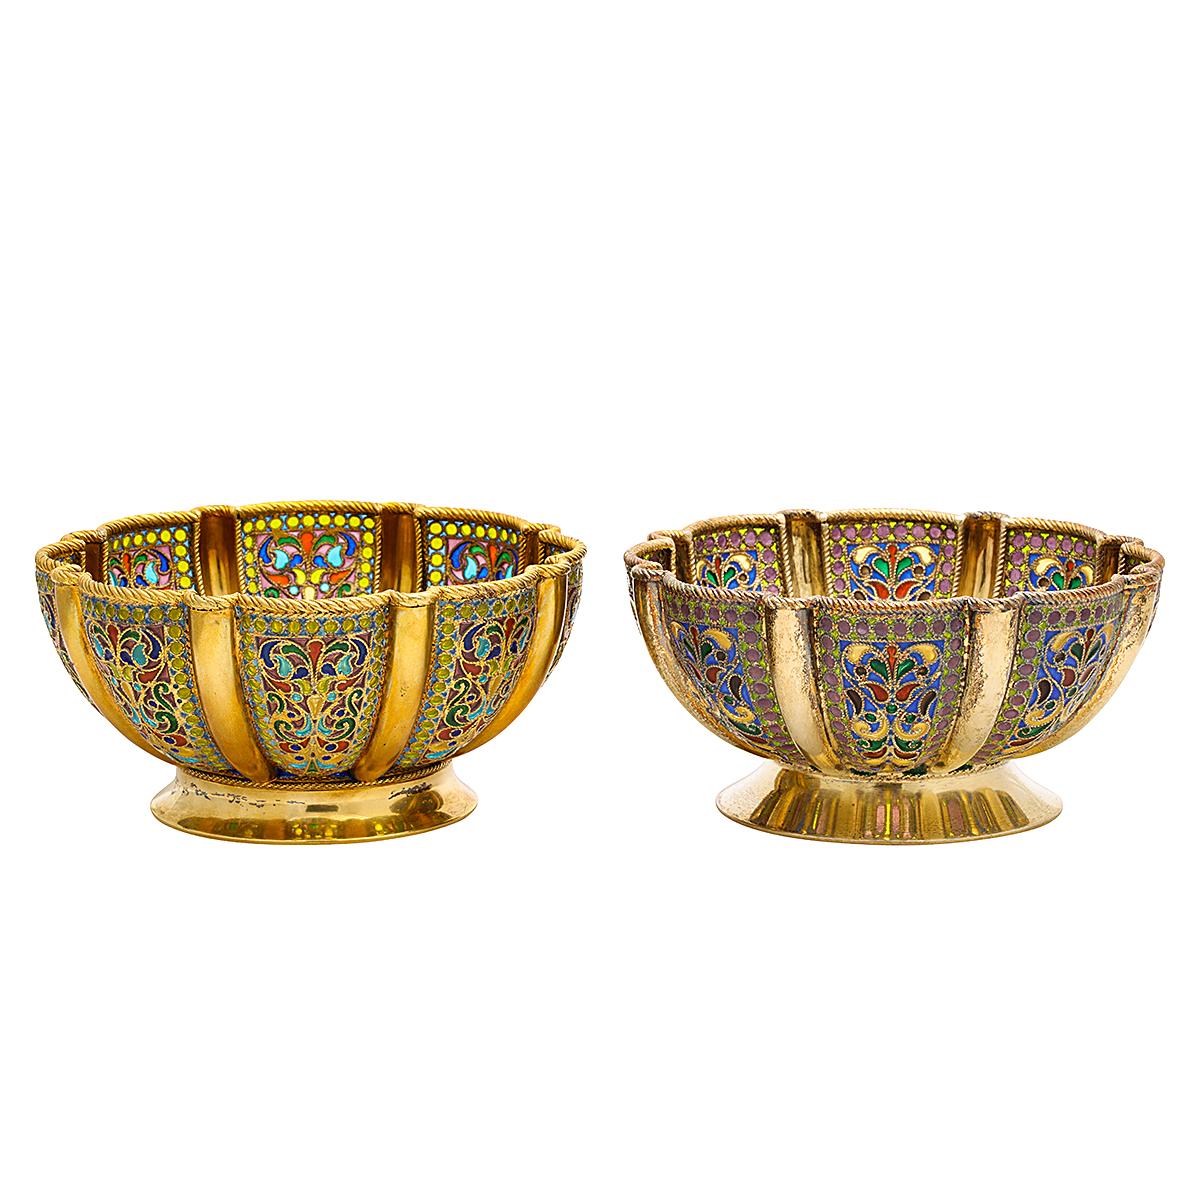 main view, antique Russian enamel bowls by Khlebnikov